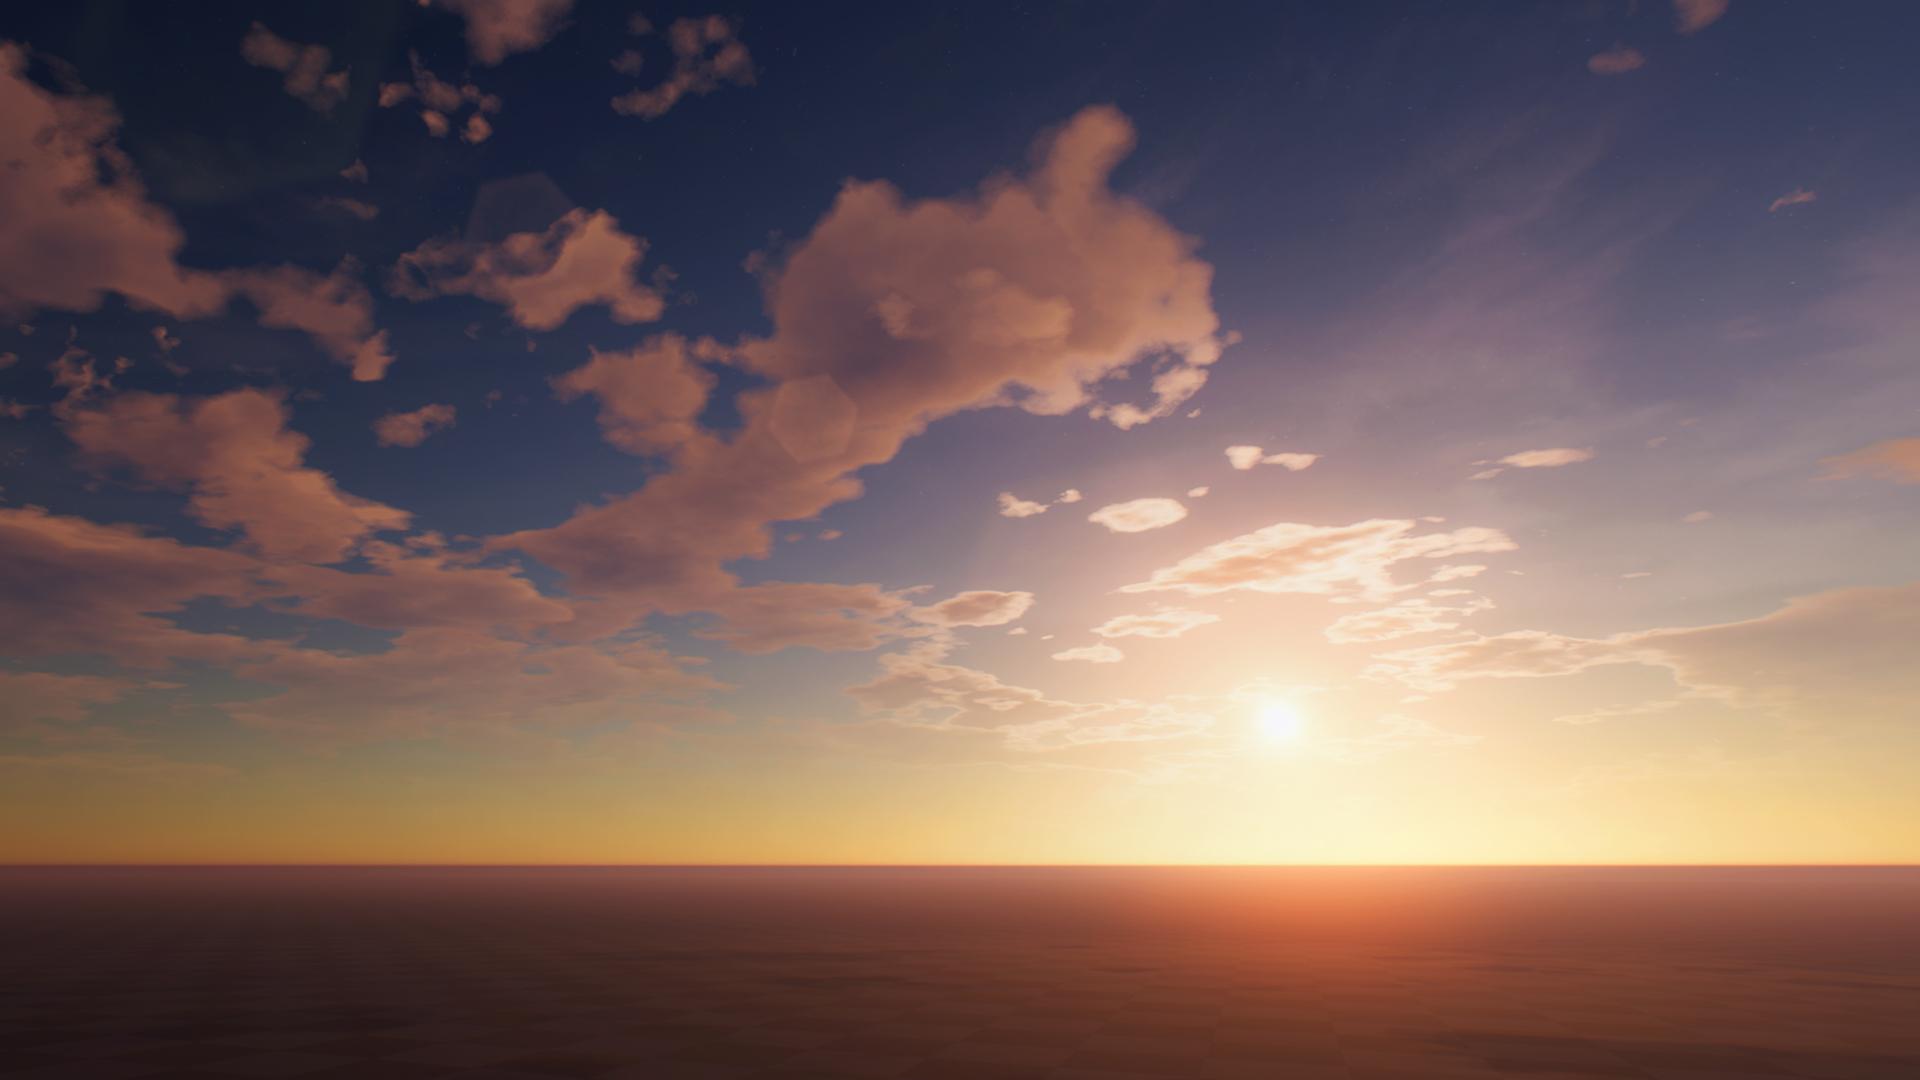 Ultra Dynamic Sky By Everett Gunther In Blueprints Ue4 Marketplace